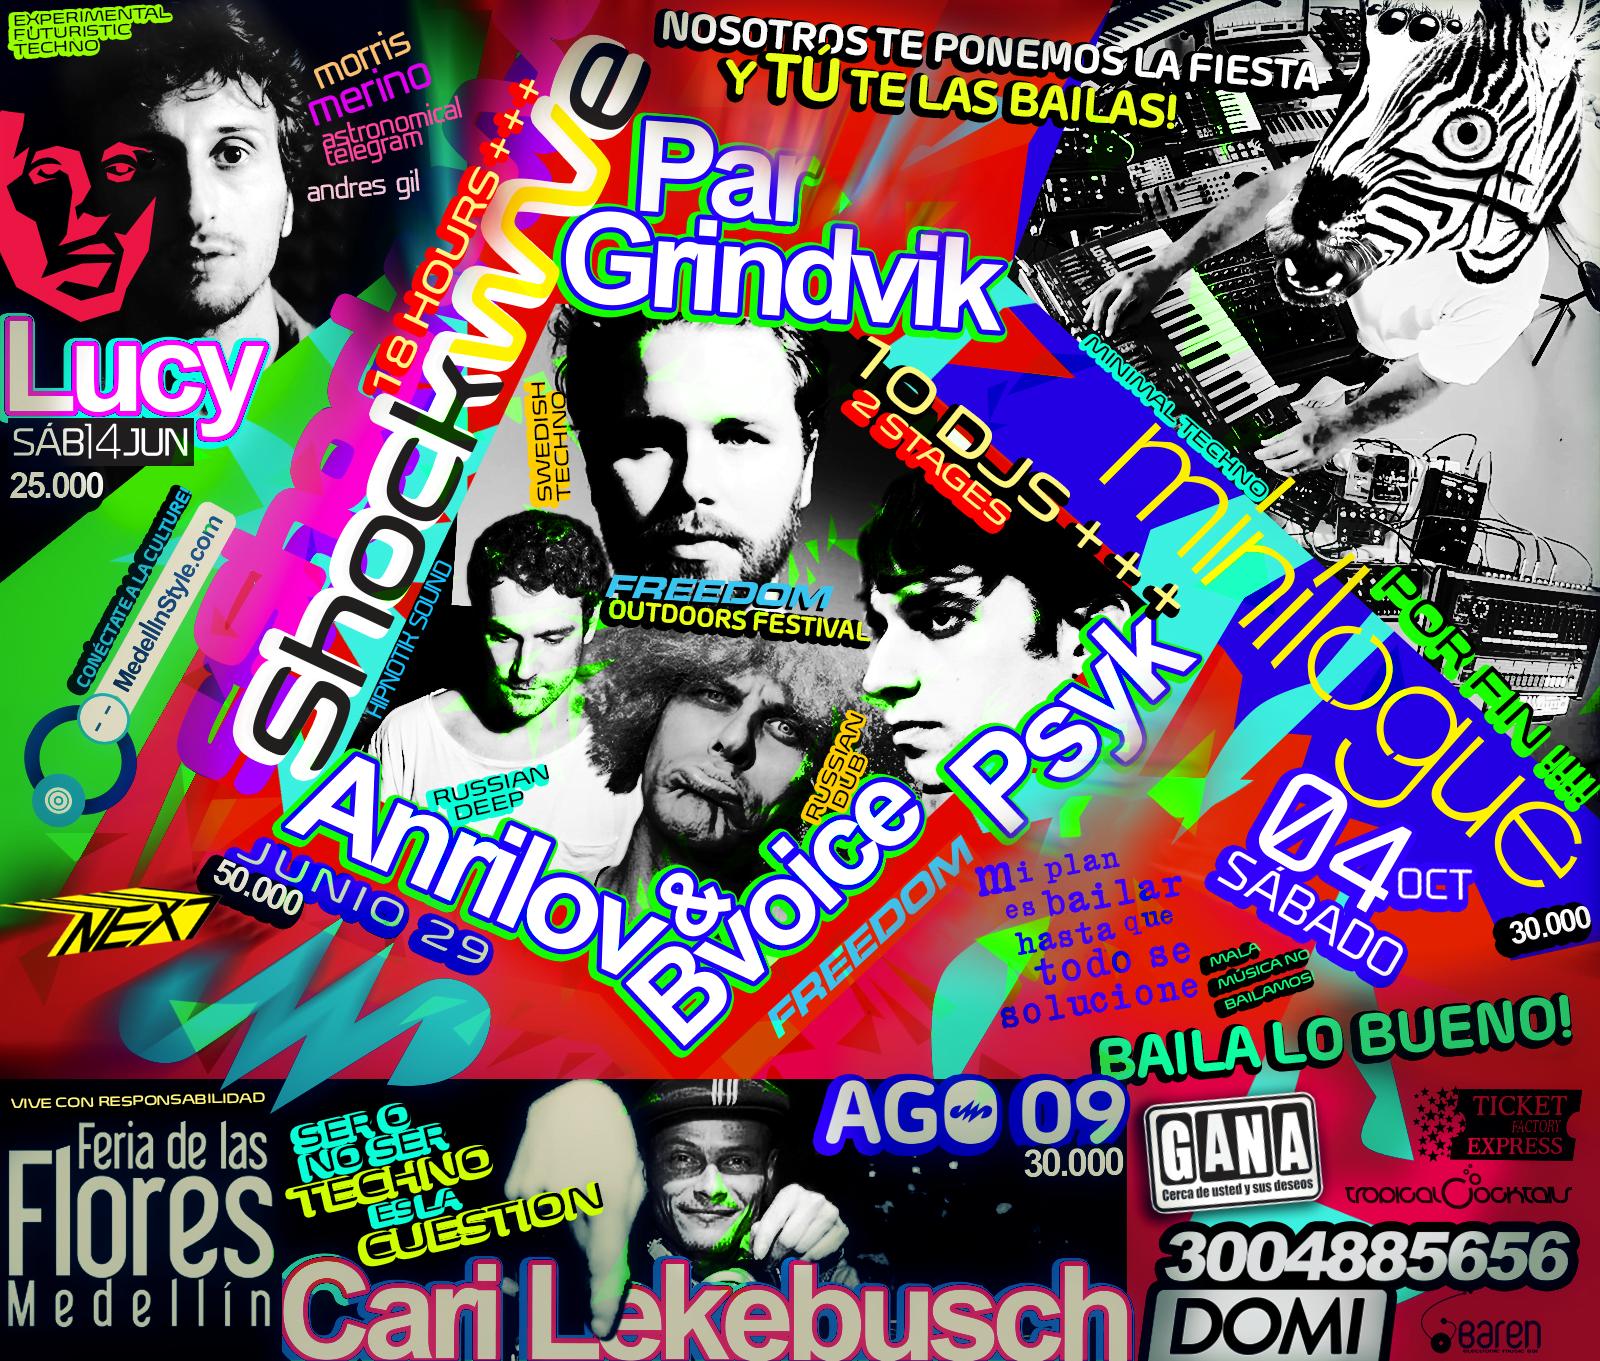 Llama YA! 3004885656 tus boletas para Lucy, Shockwave, Cari Lekebusch a DOMICILIO !